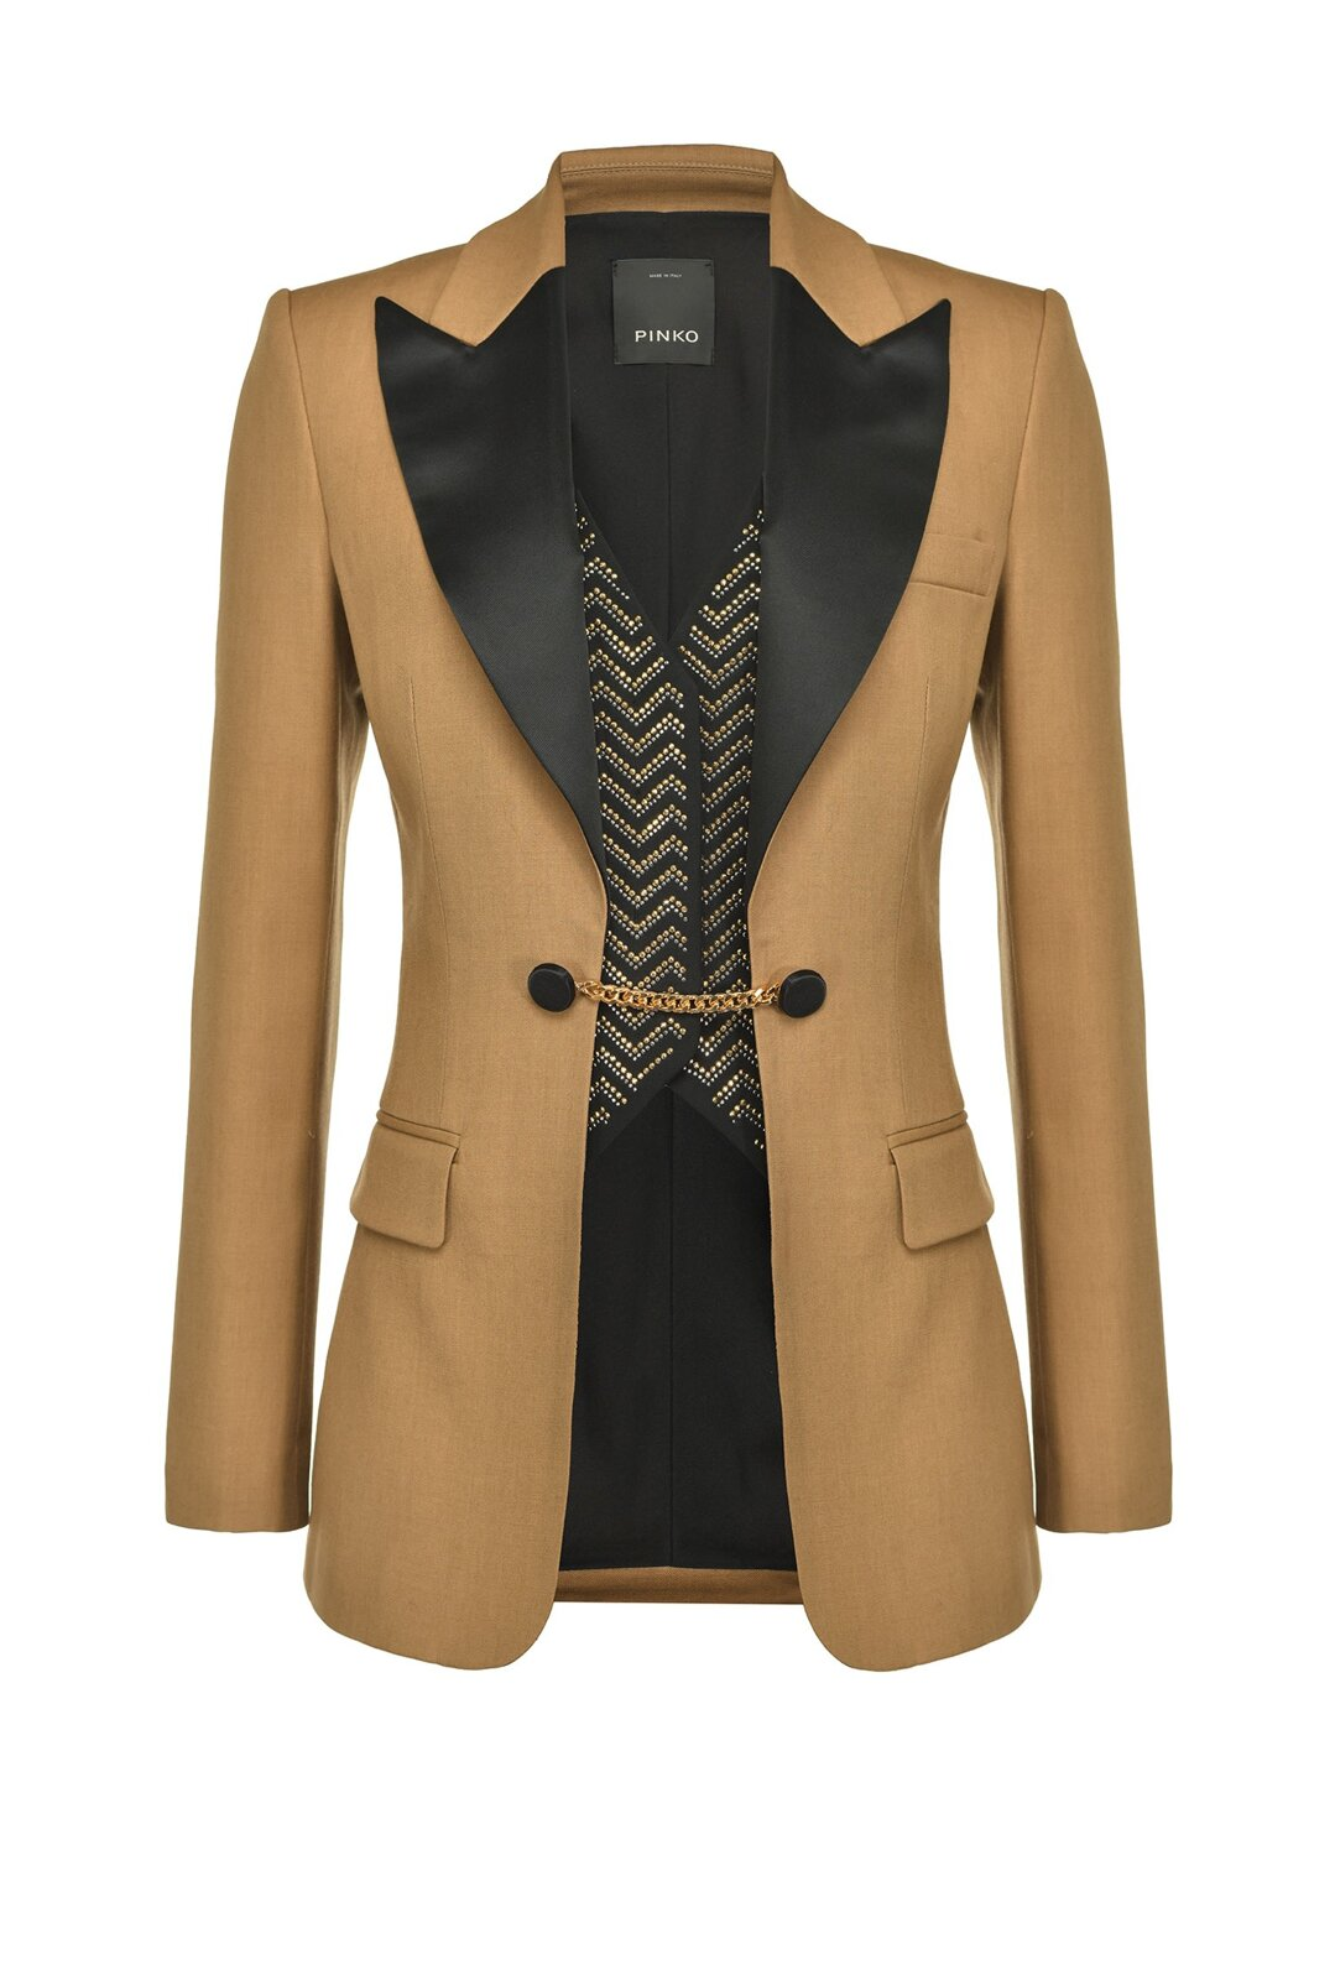 Blazer With Vest Embellished With Metal Rhinestones - Pinko